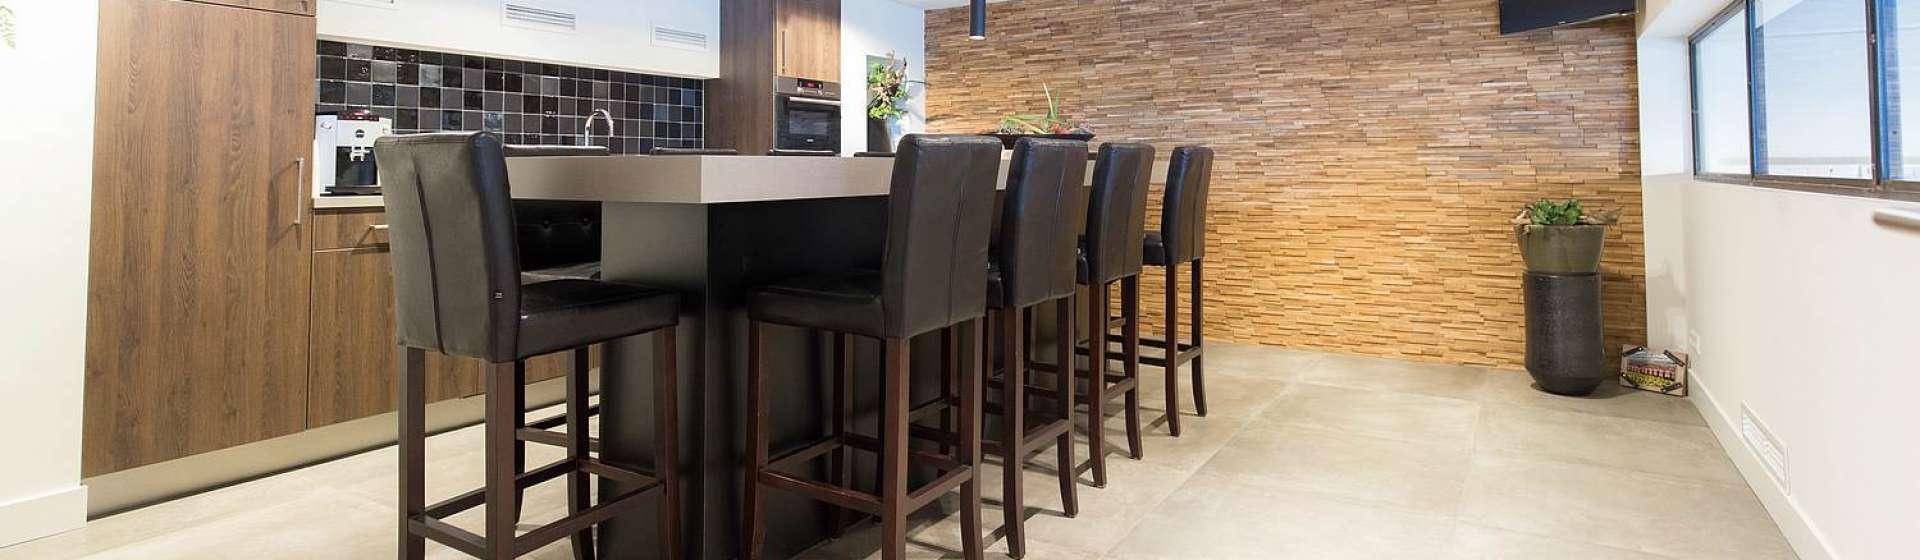 wandtegels keuken flevoland : Stone Concepts Naaldwijk Tegels Nl